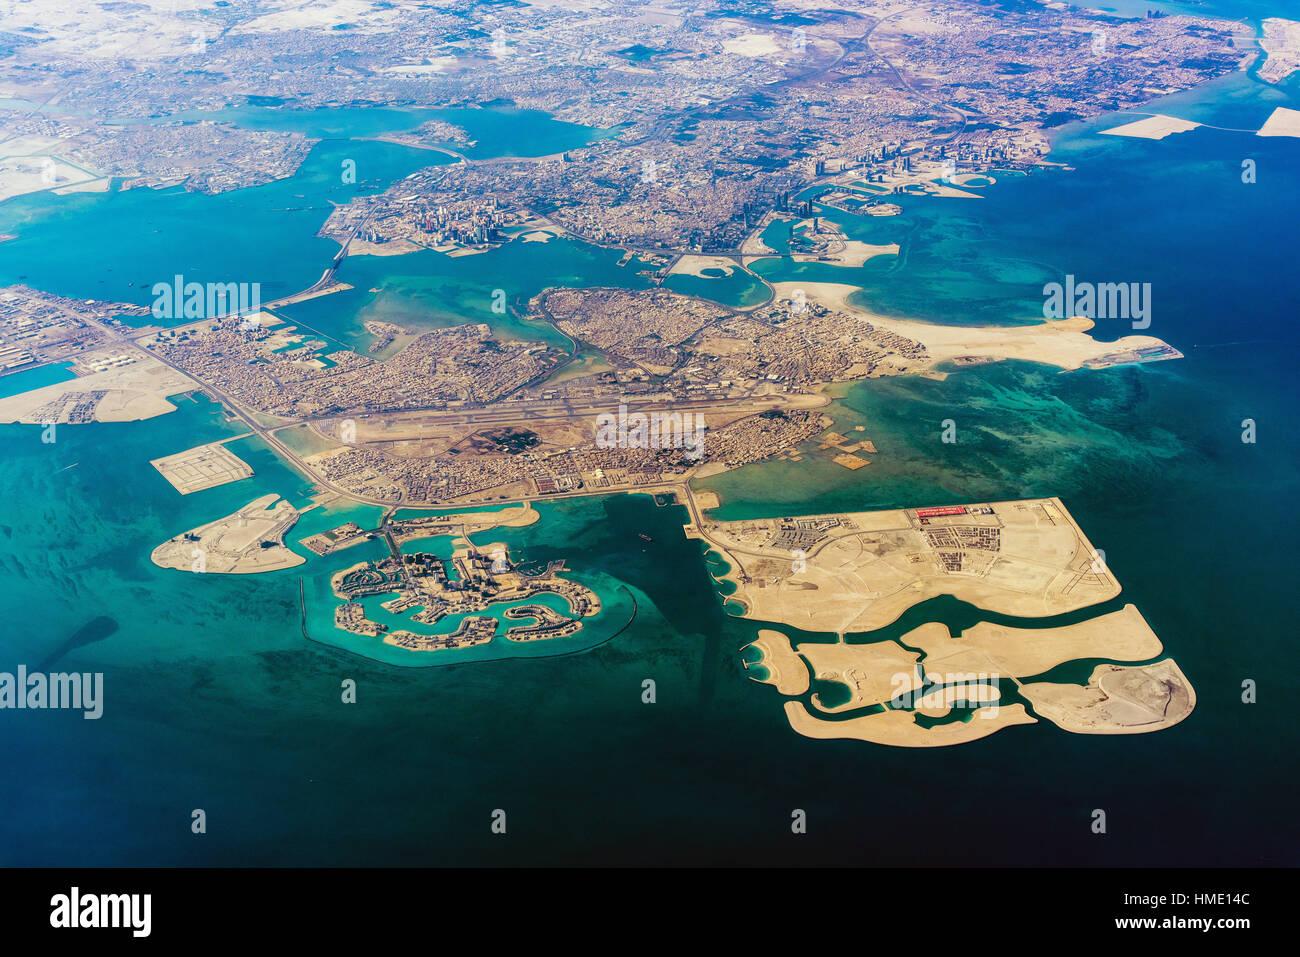 Aerial view of Manama, Bahrain - Stock Image